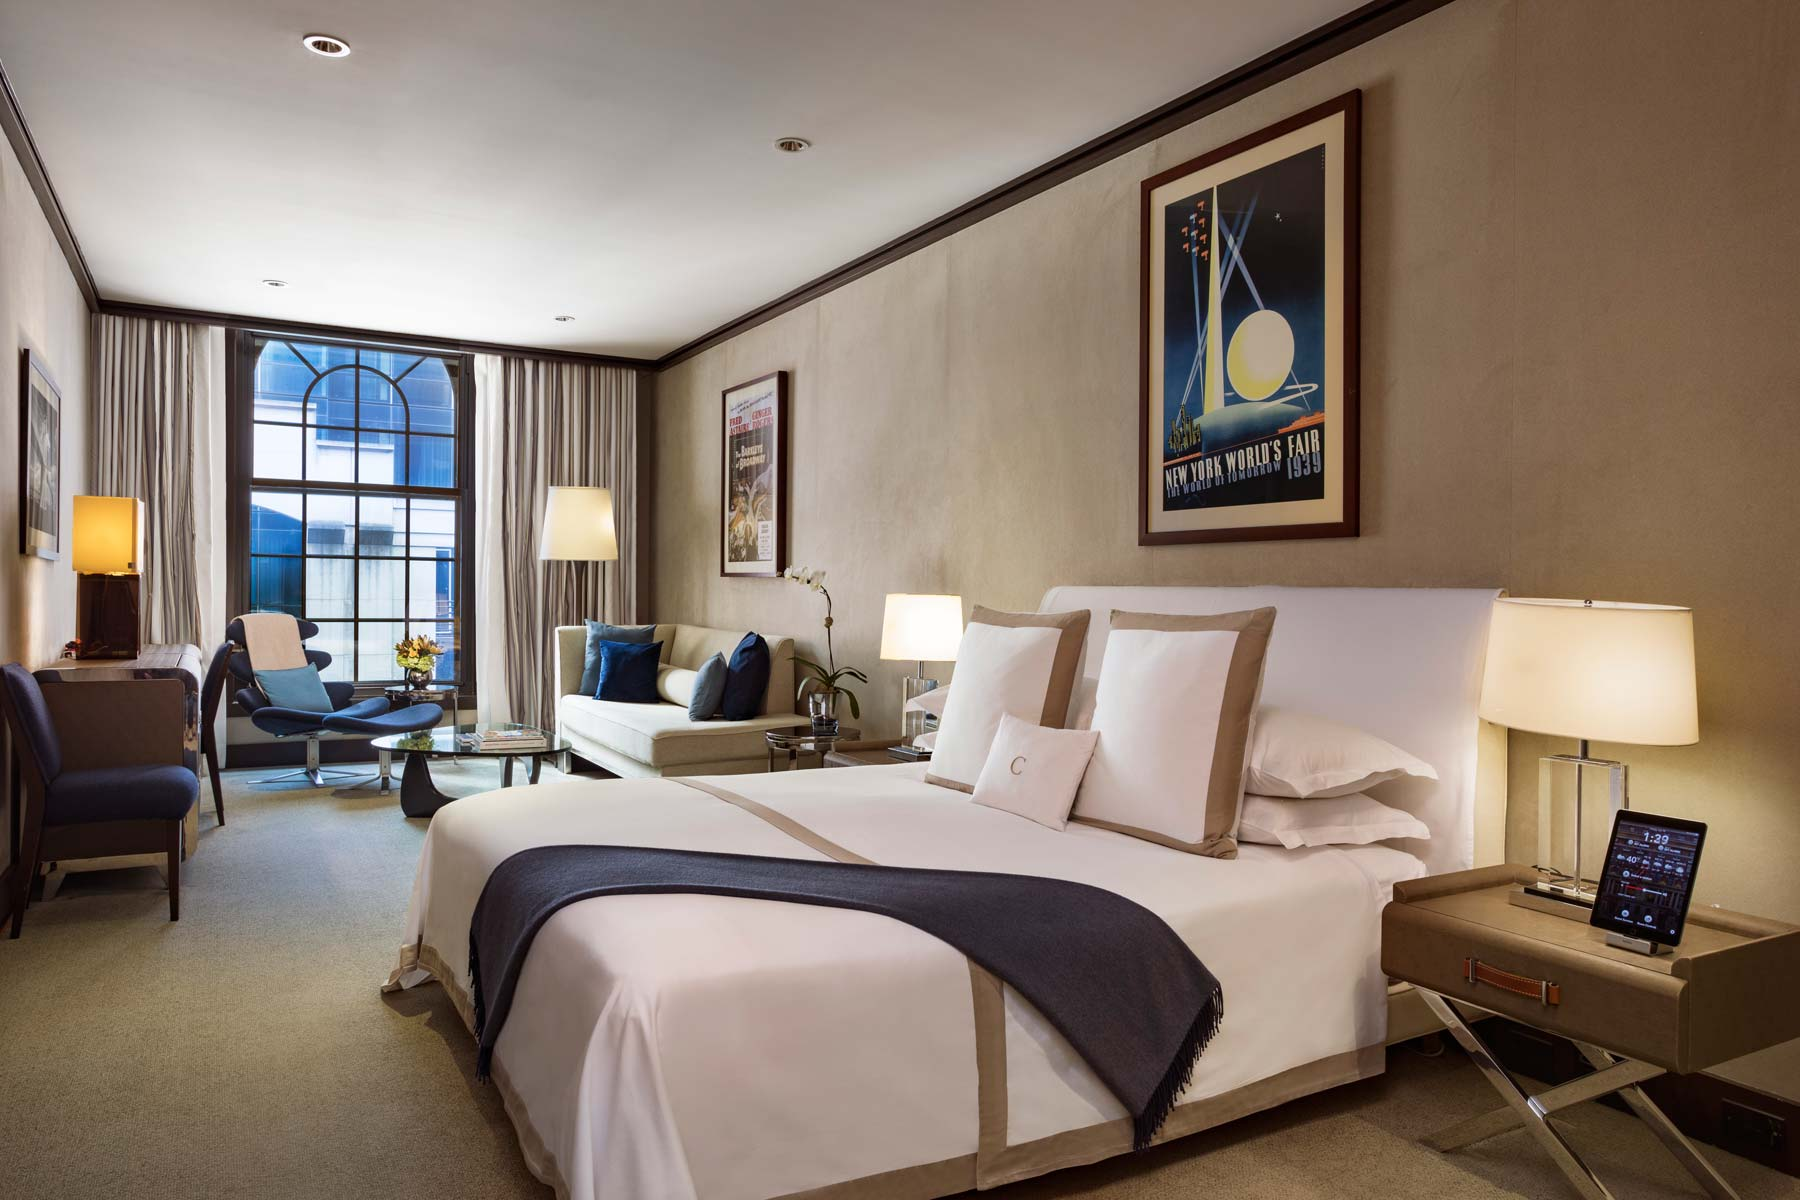 Junior Suite King - Luxury Hotel In York